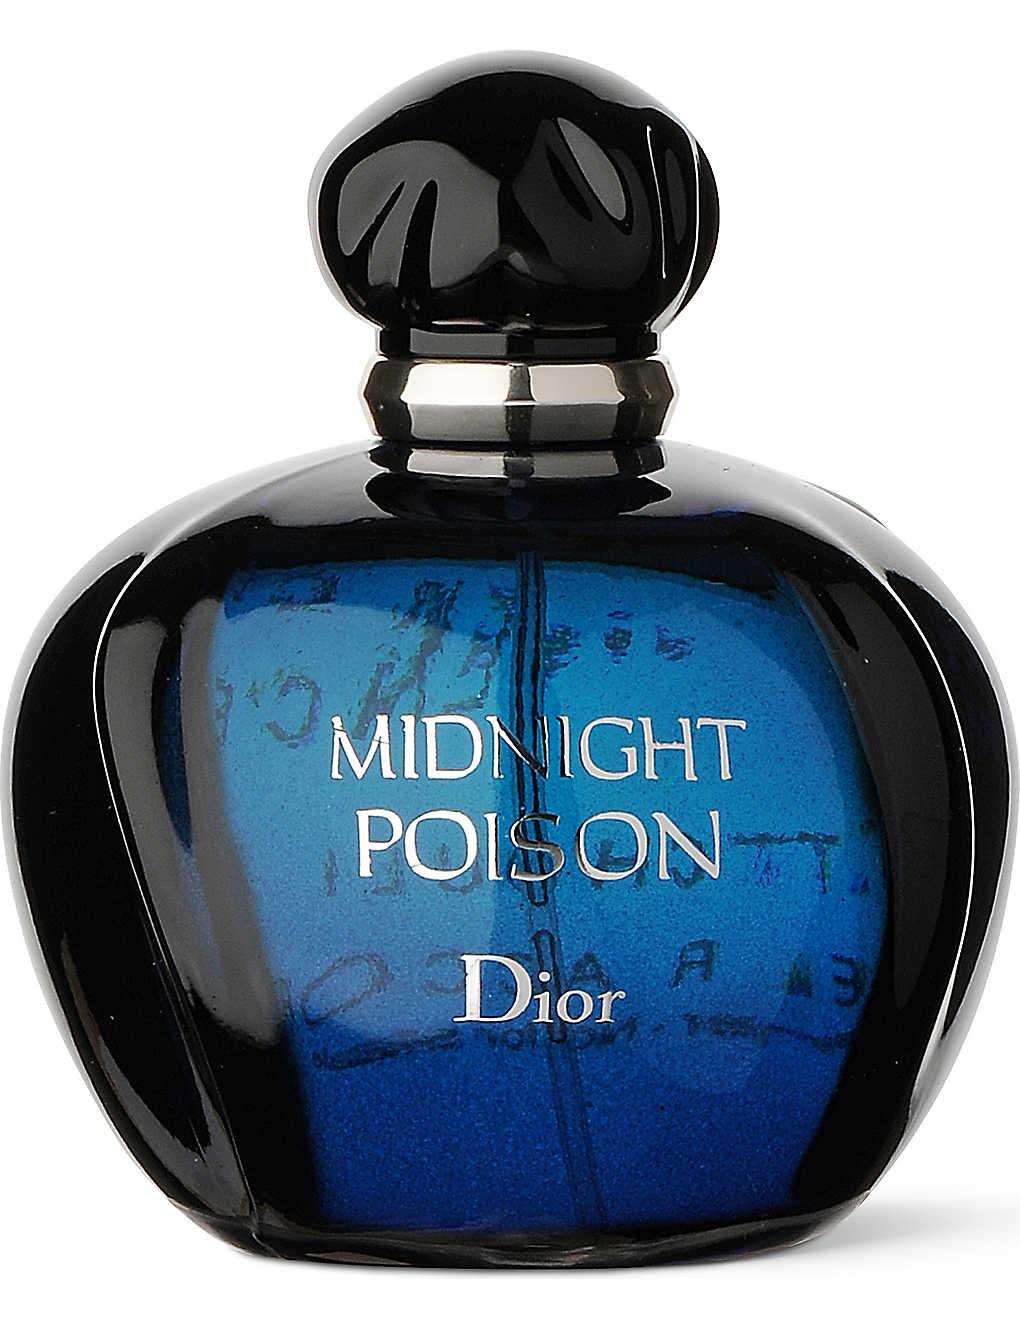 Dior Midnight Poison Eau De Parfum 100ml Selfridgescom